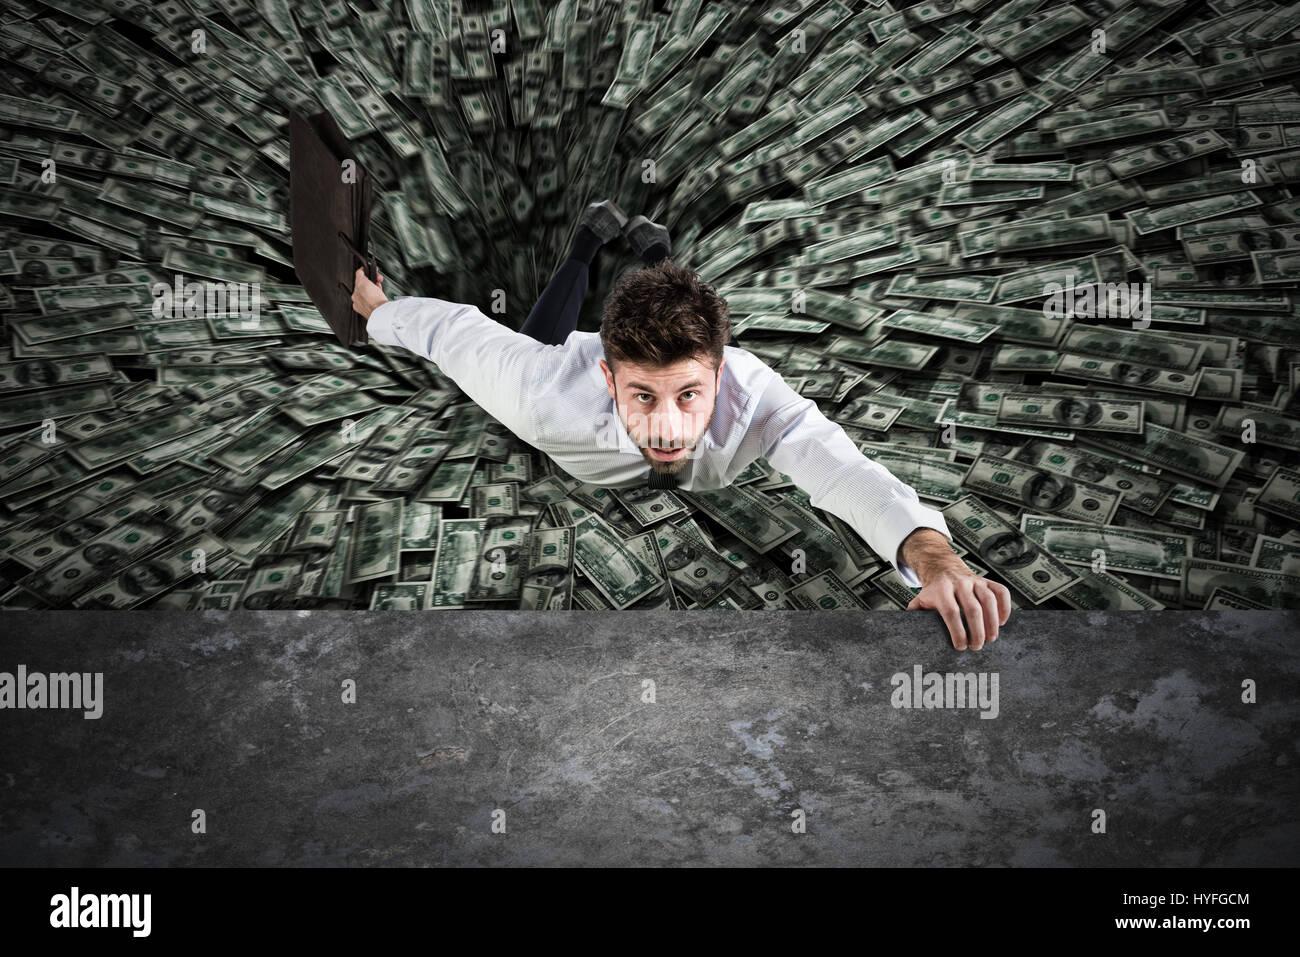 Agujero Negro de dinero Imagen De Stock